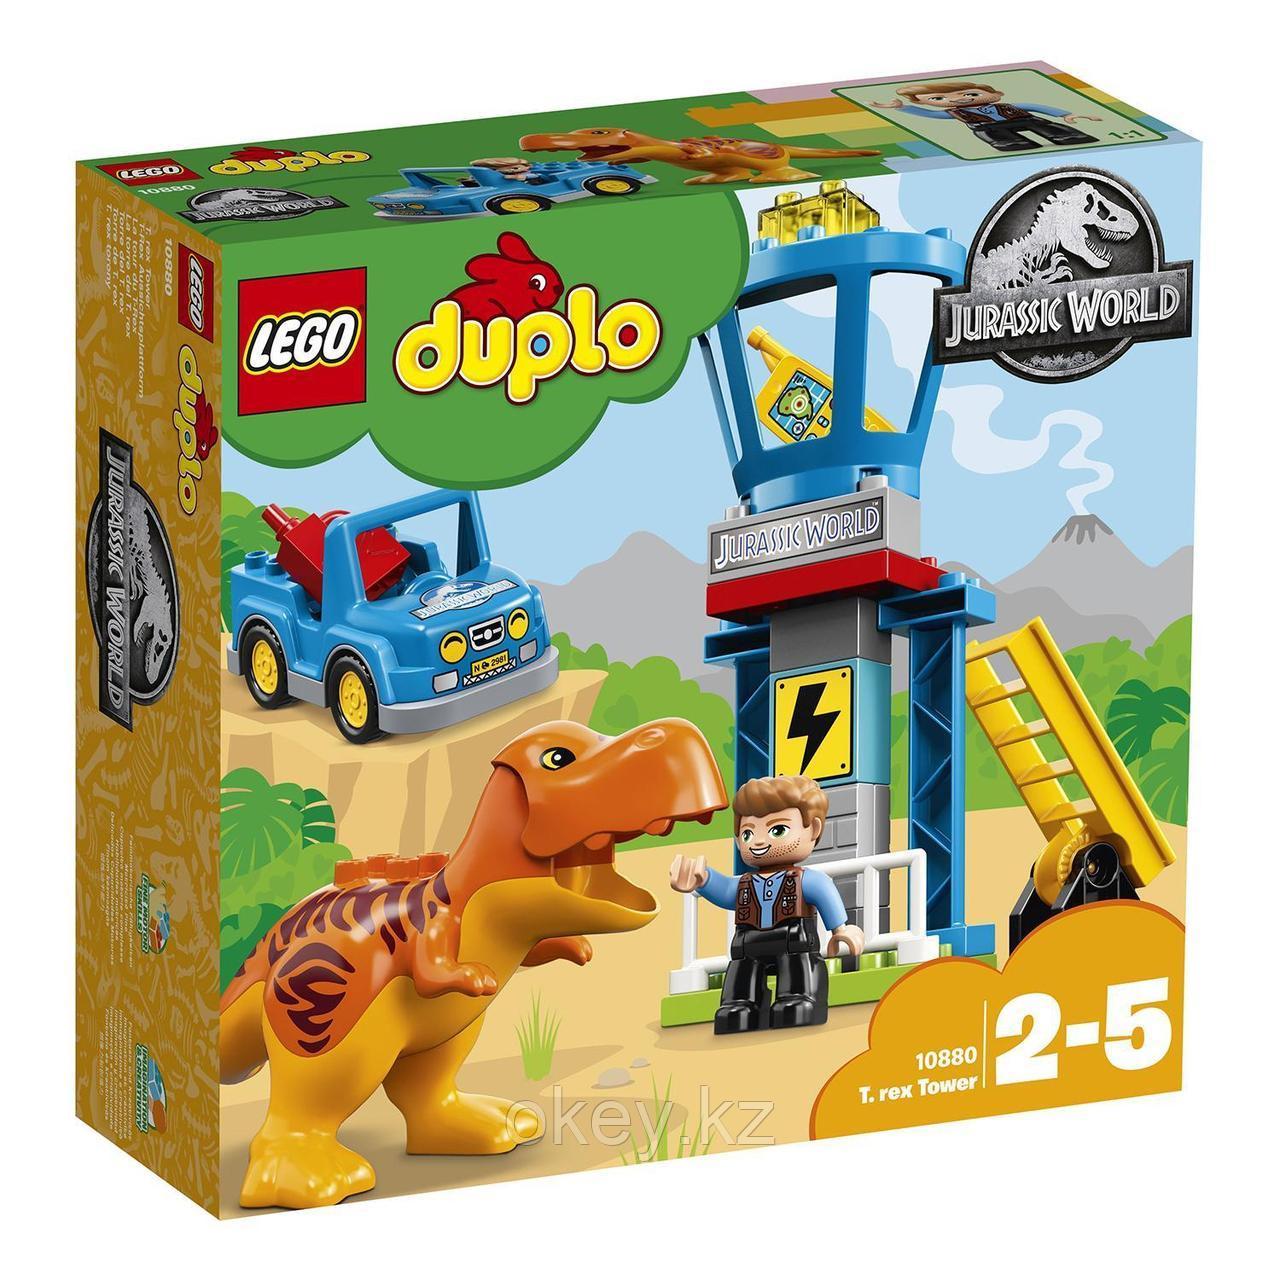 LEGO Duplo: Jurassic World — Башня ти-рекса 10880